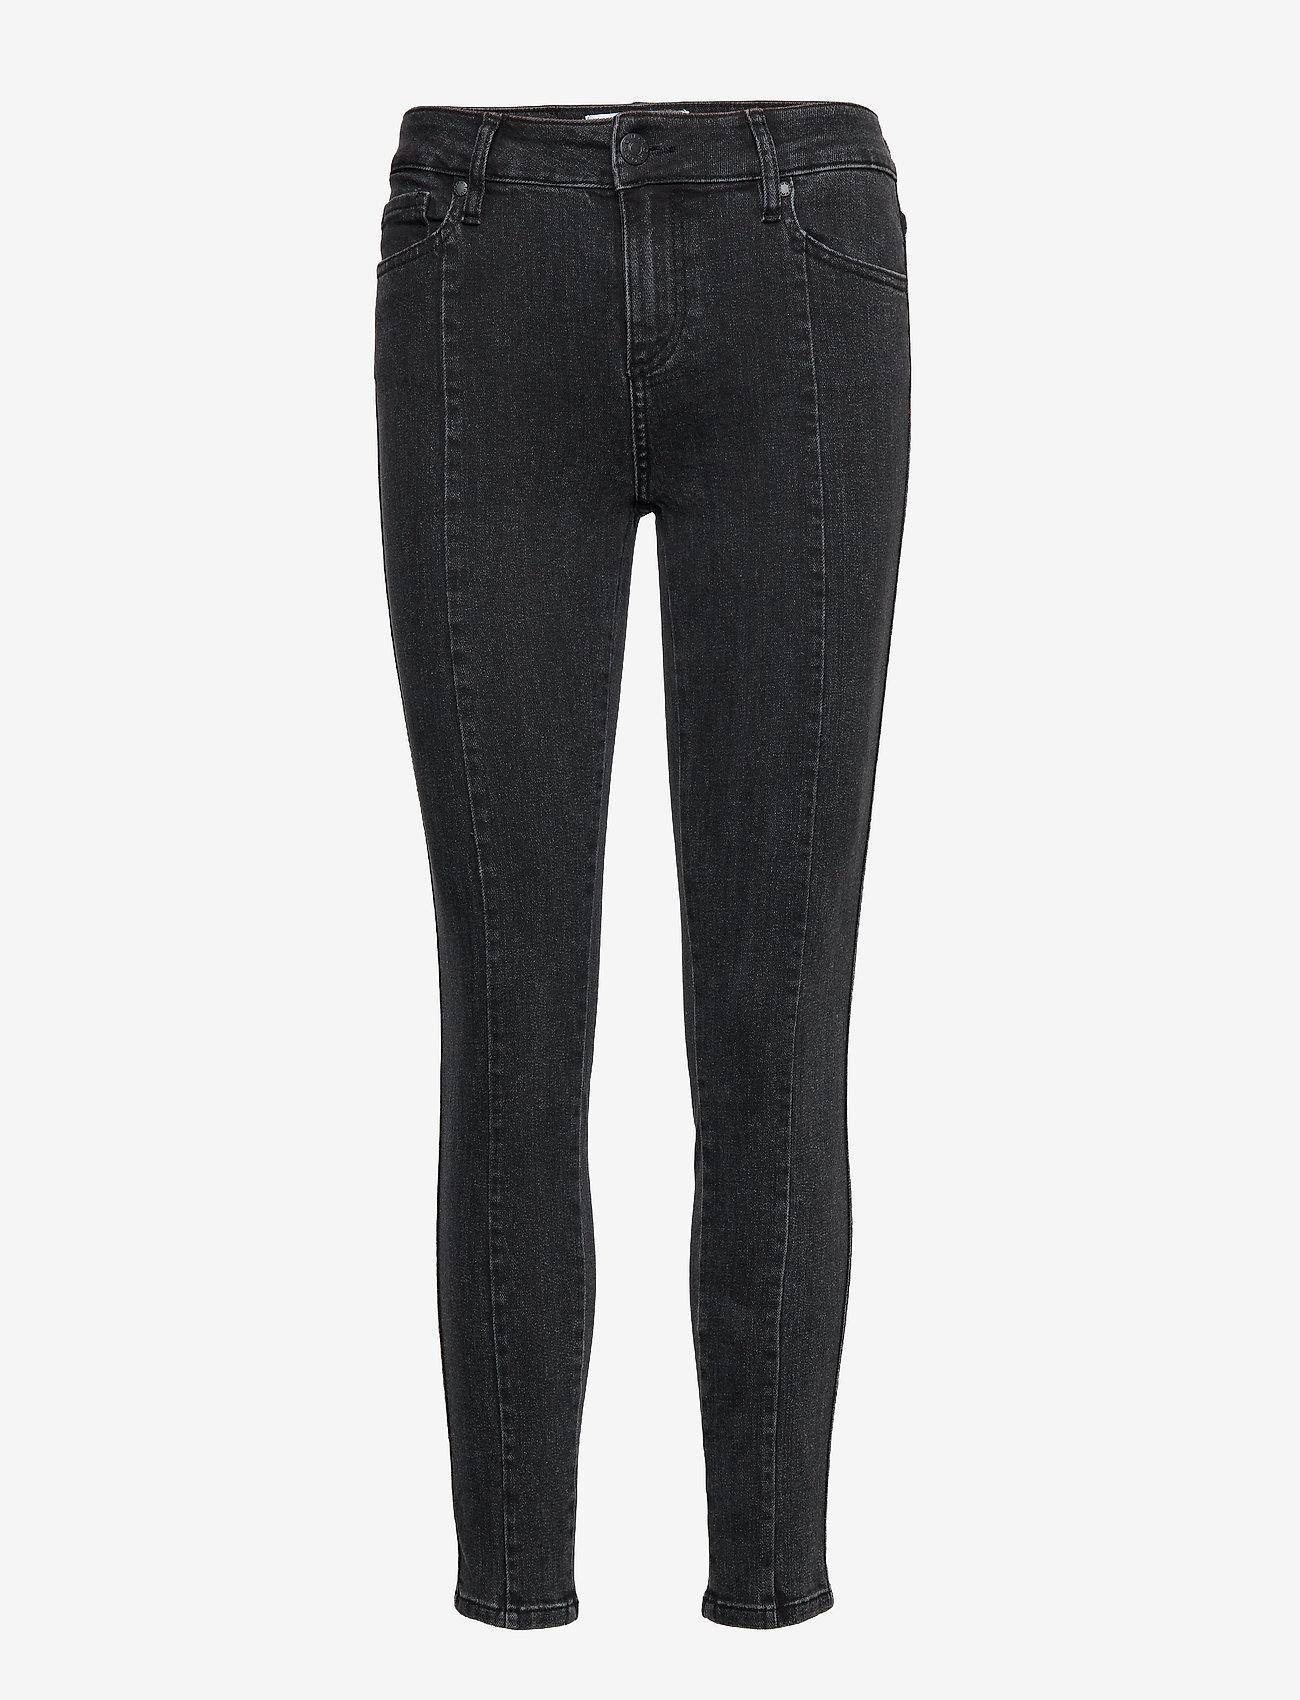 Tomorrow - Dylan MW cropped original black - skinny jeans - black - 0